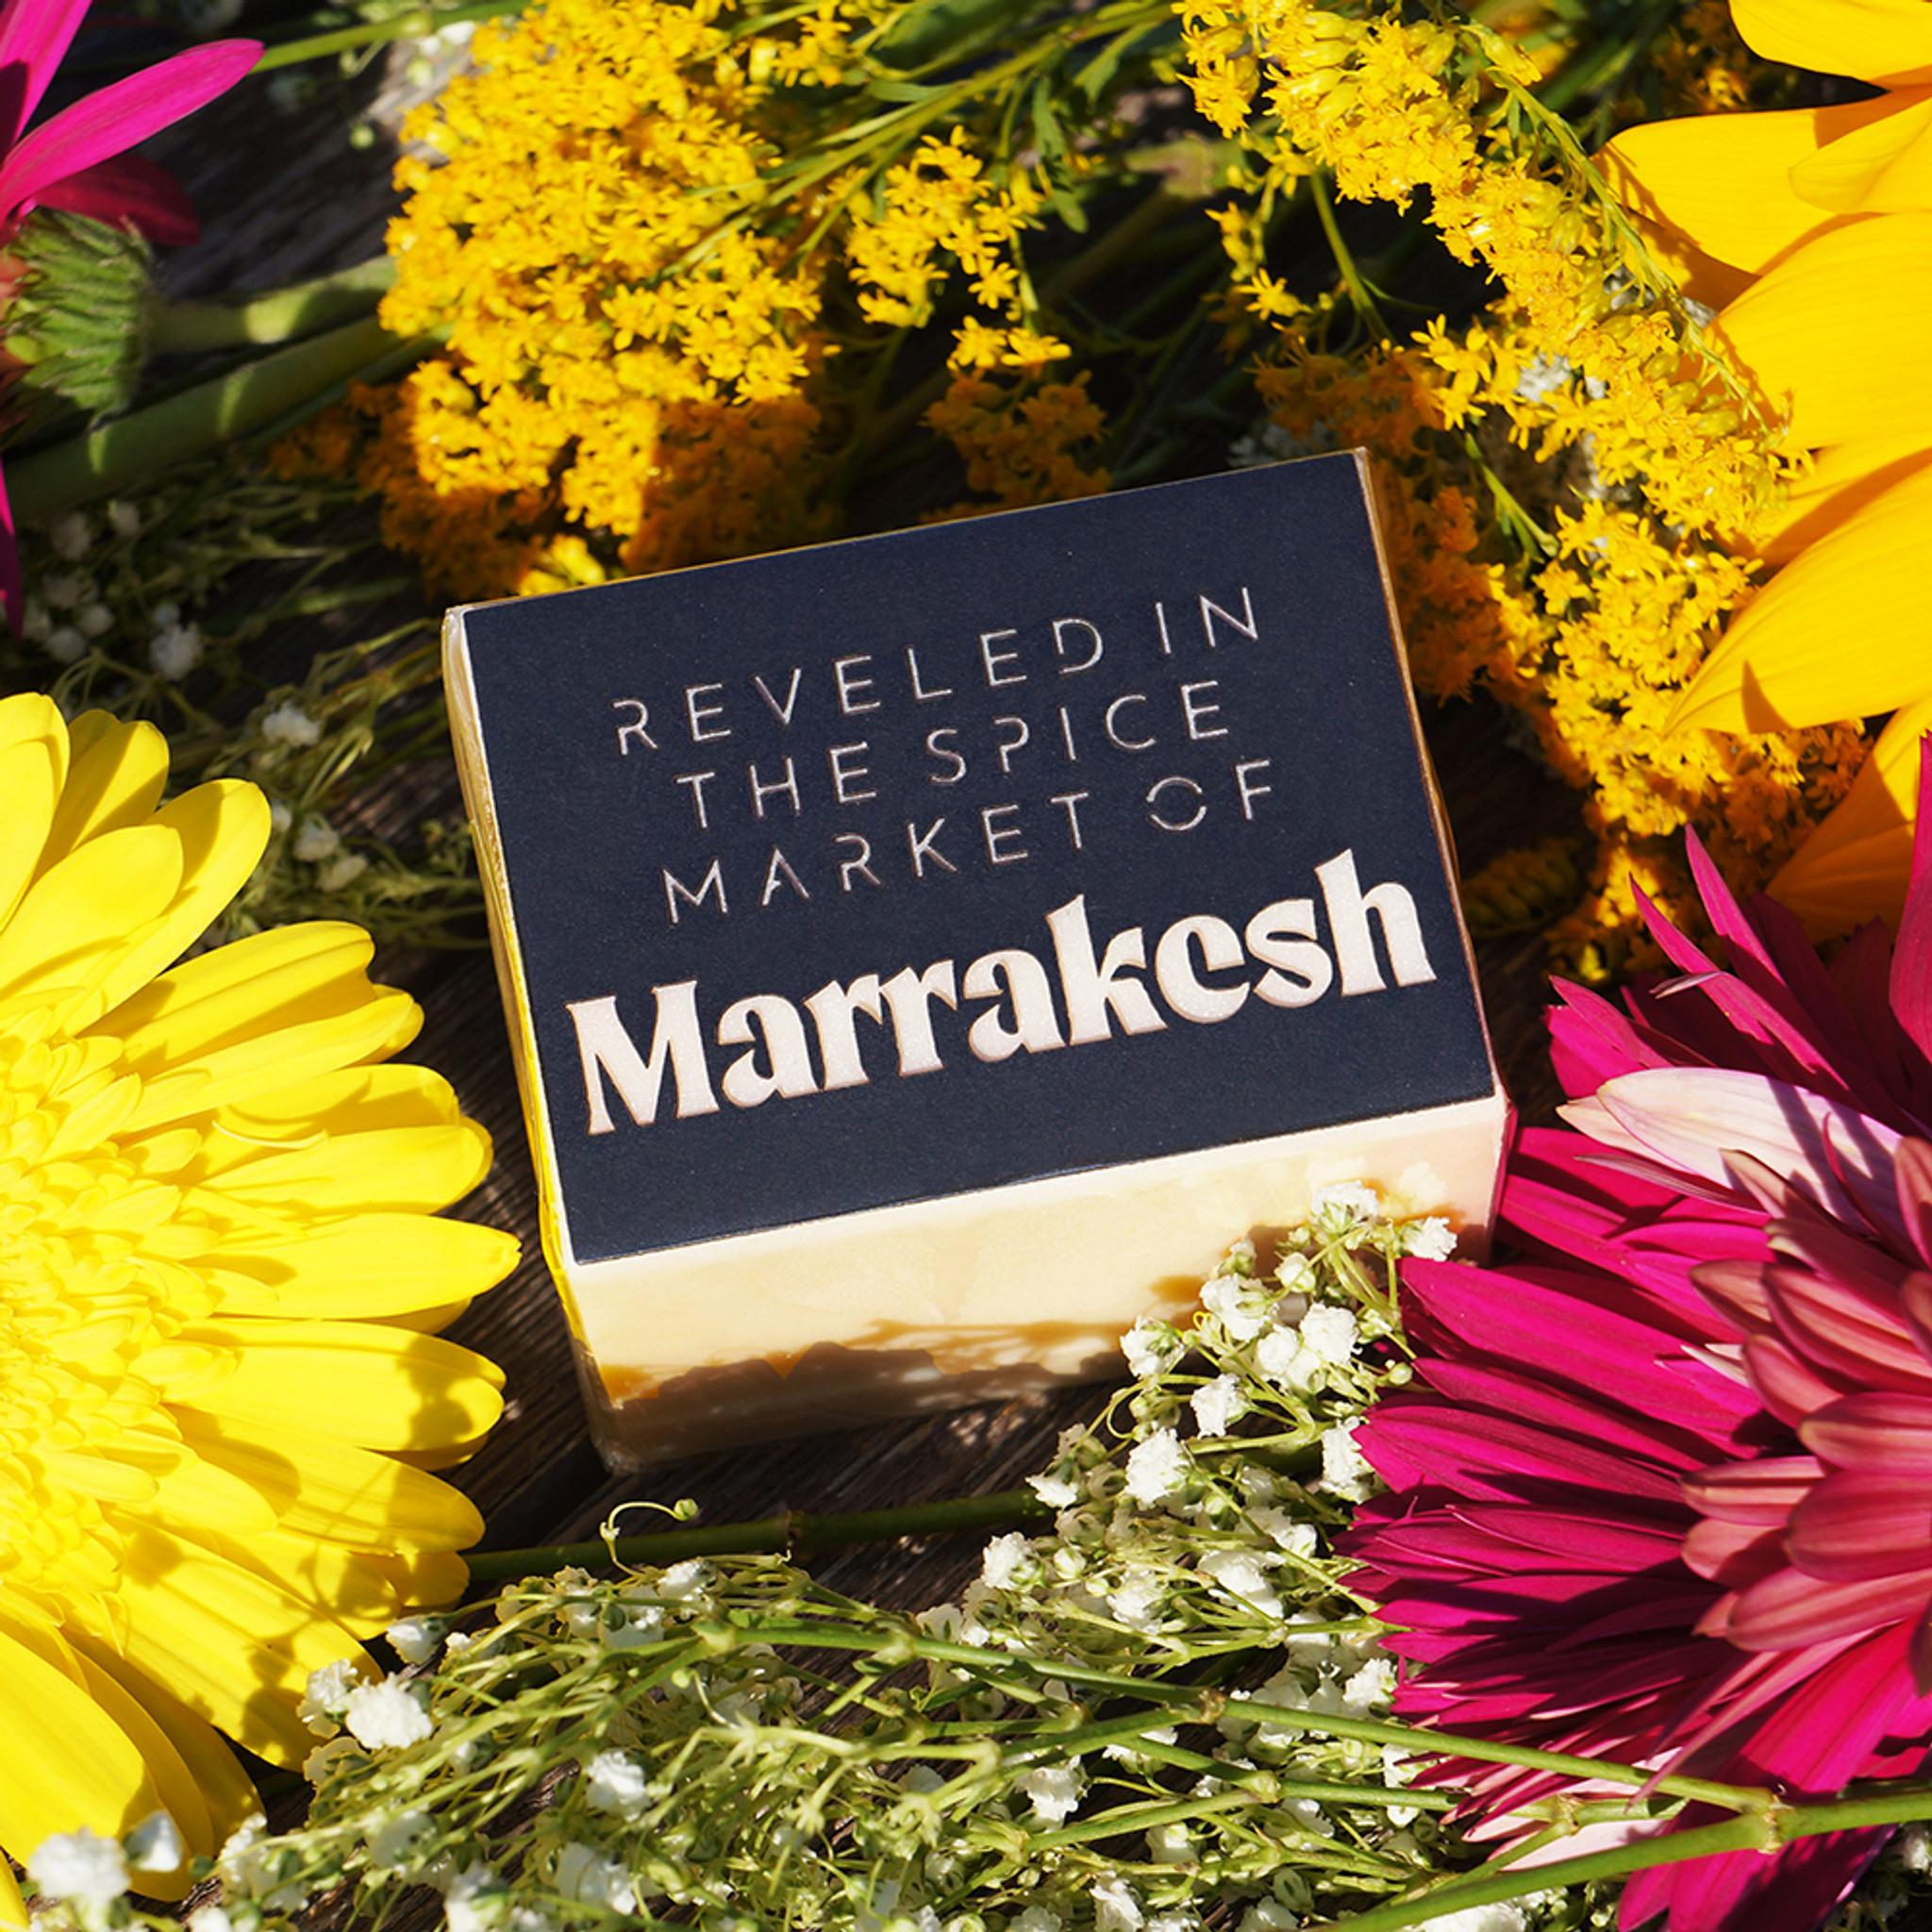 reveled in the spice market of Marrakesh